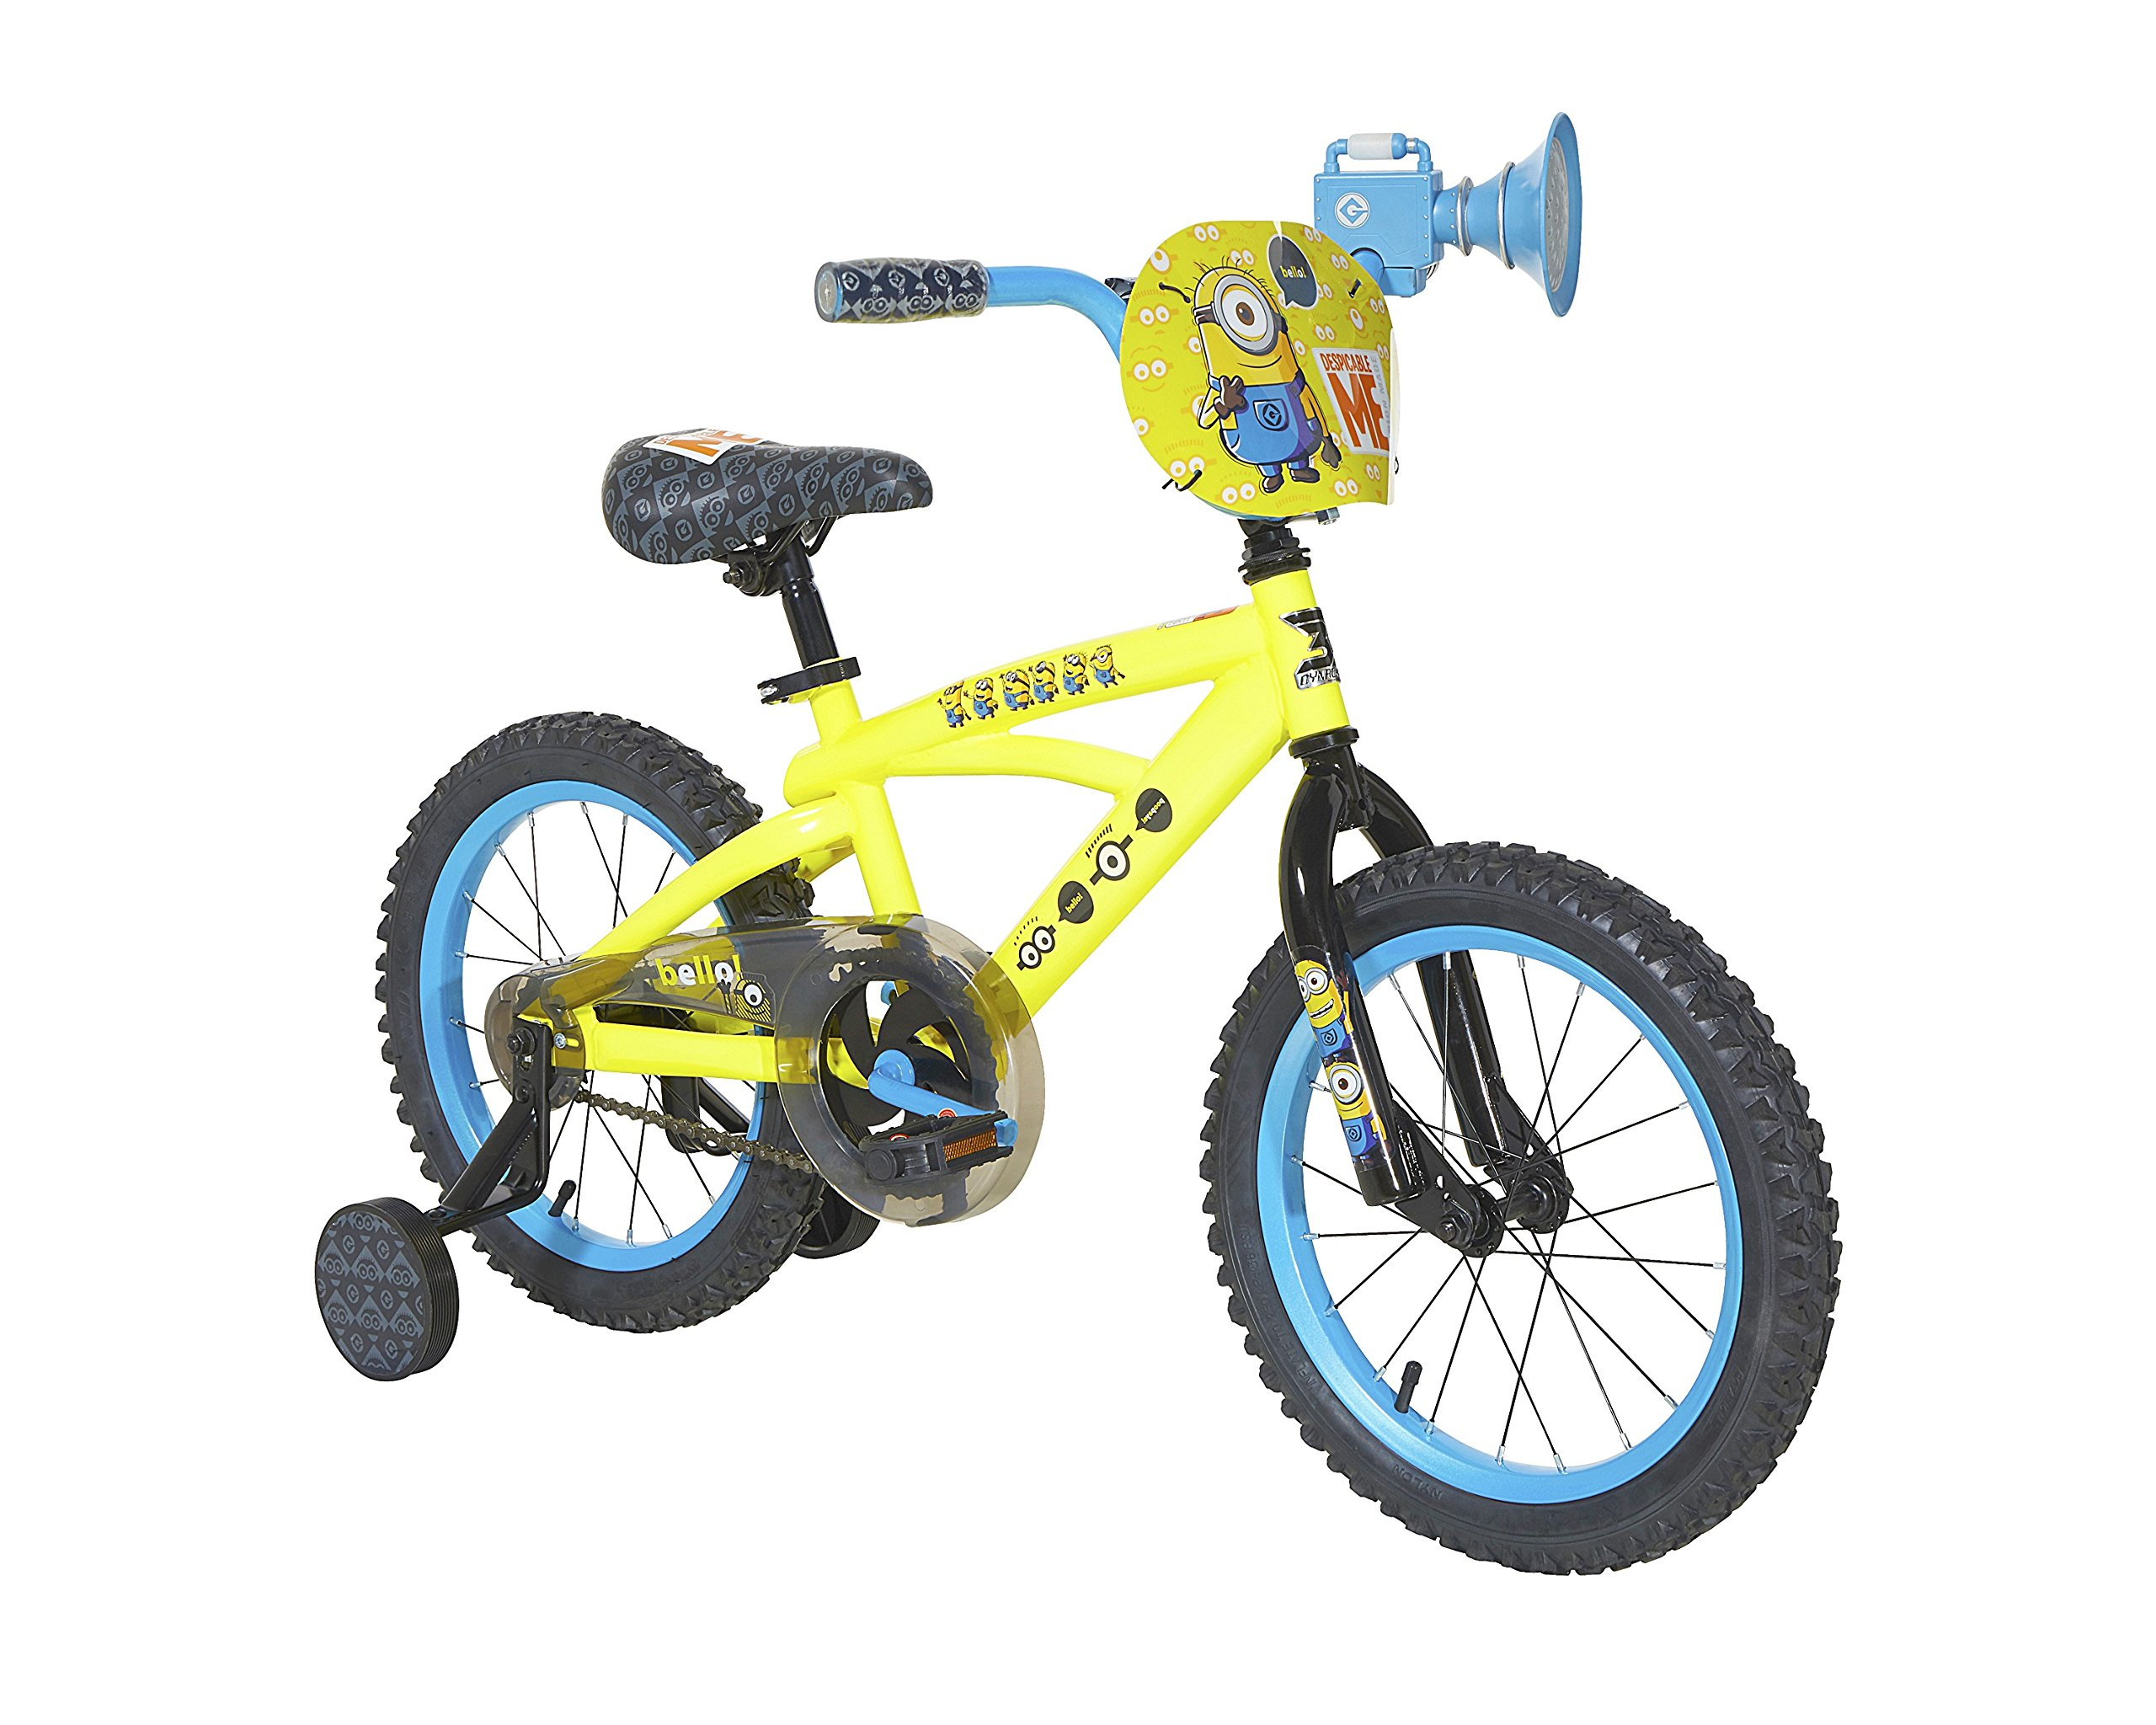 Minions Boys Dynacraft Bike, Yellow/Blue/Black, 16''